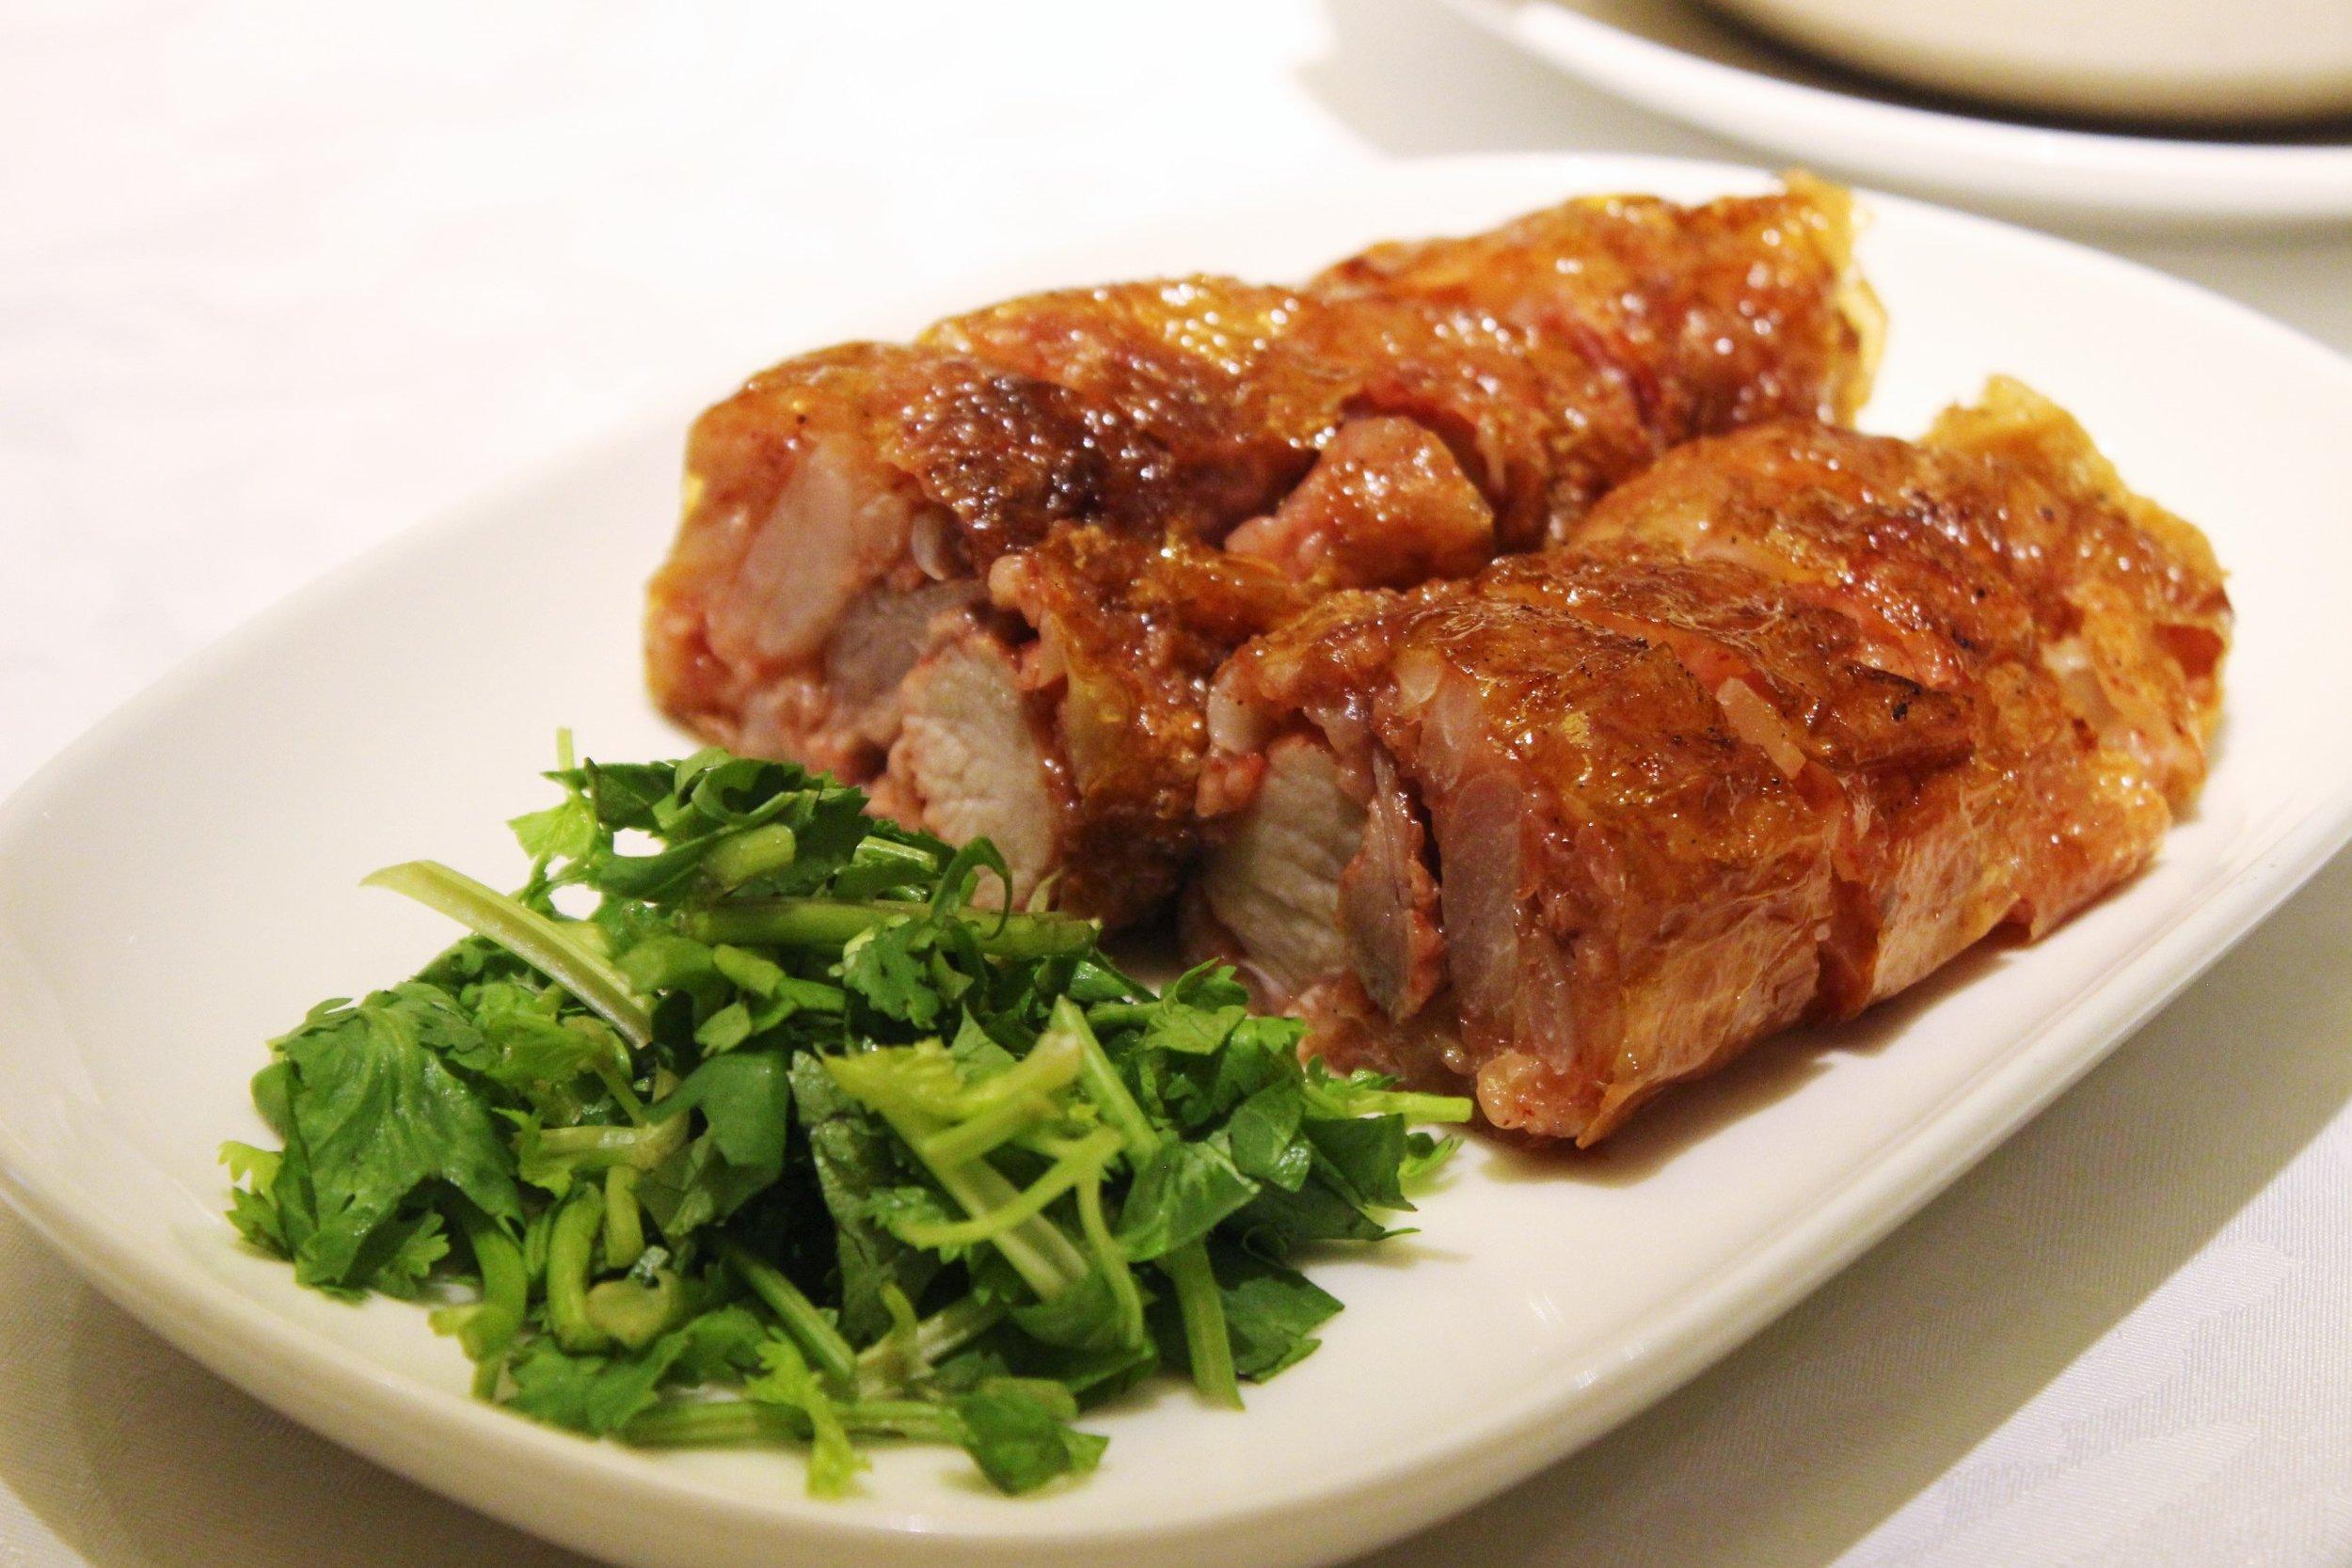 Deep Fried Pork Roulade with Coriander & Hai-San Sauce 五香雞卷